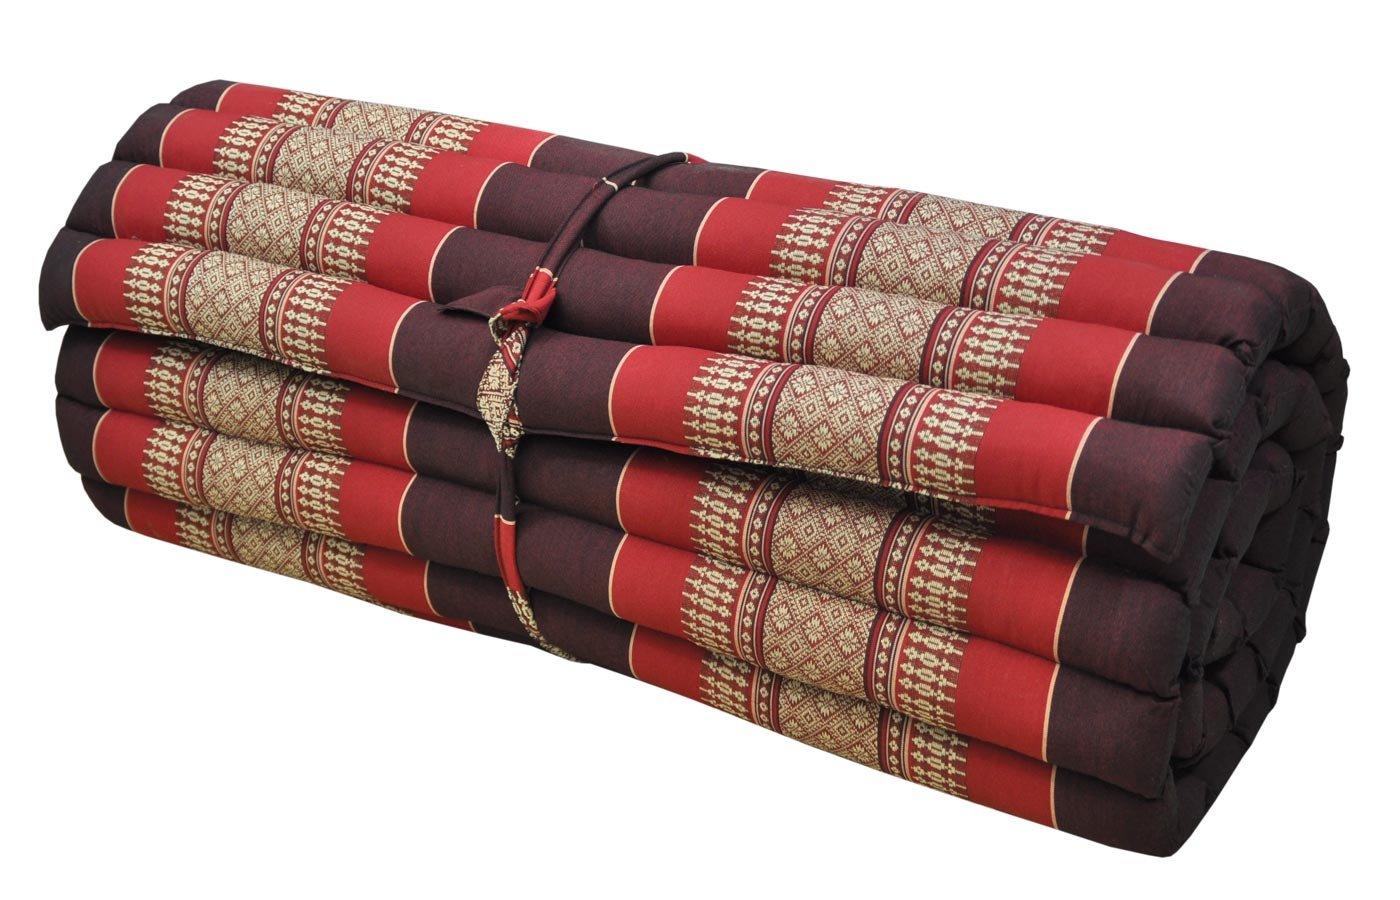 Thai mattress big size (75/180), burgundy/red, relaxation, beach cushion, pool, meditation, yoga (82314)